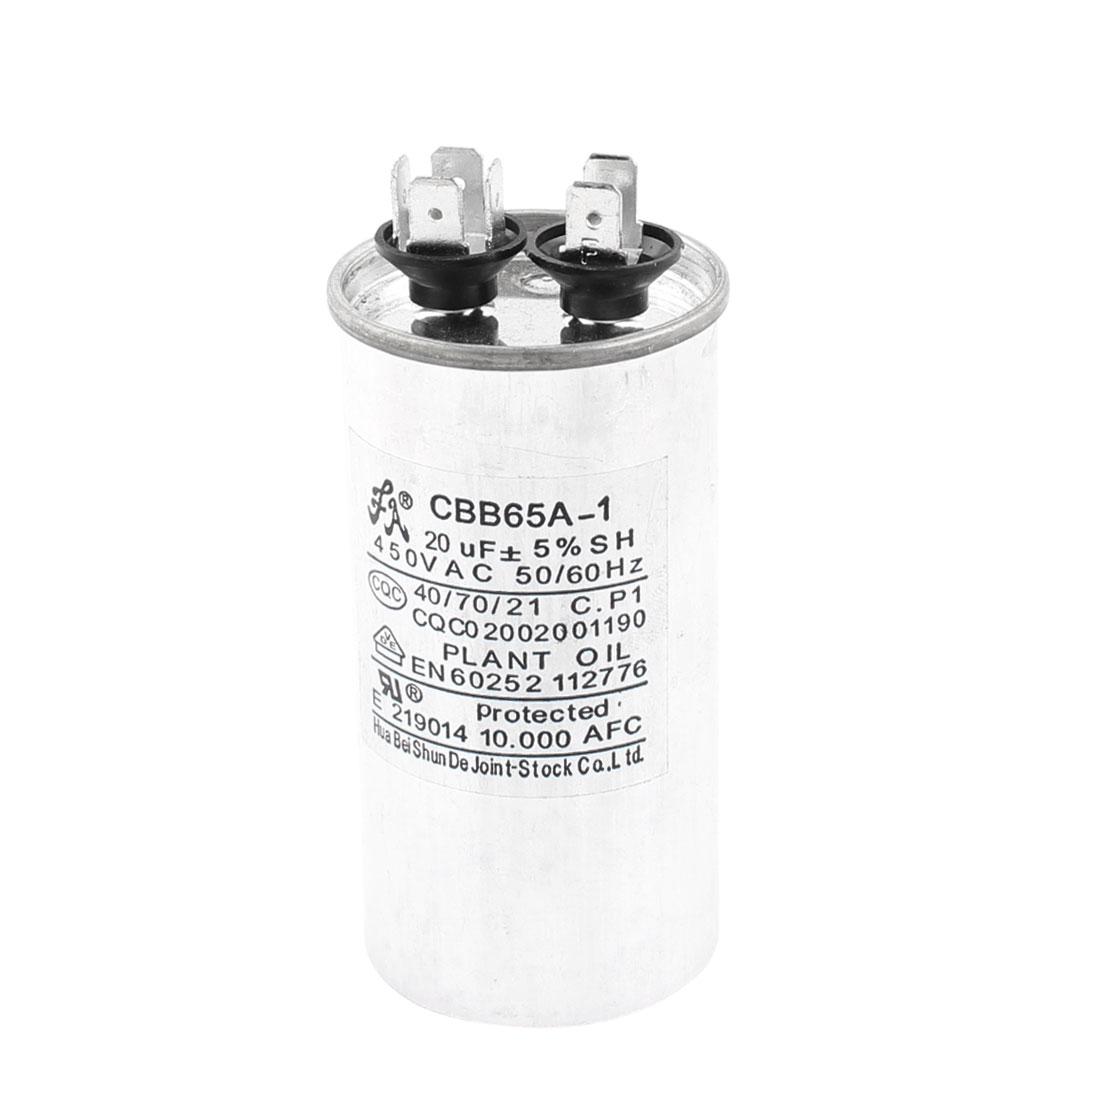 CBB65A-1 AC 450V 20uF Capacitance 5% 50/60Hz Non Polar Motor Capacitor for Air Conditioner